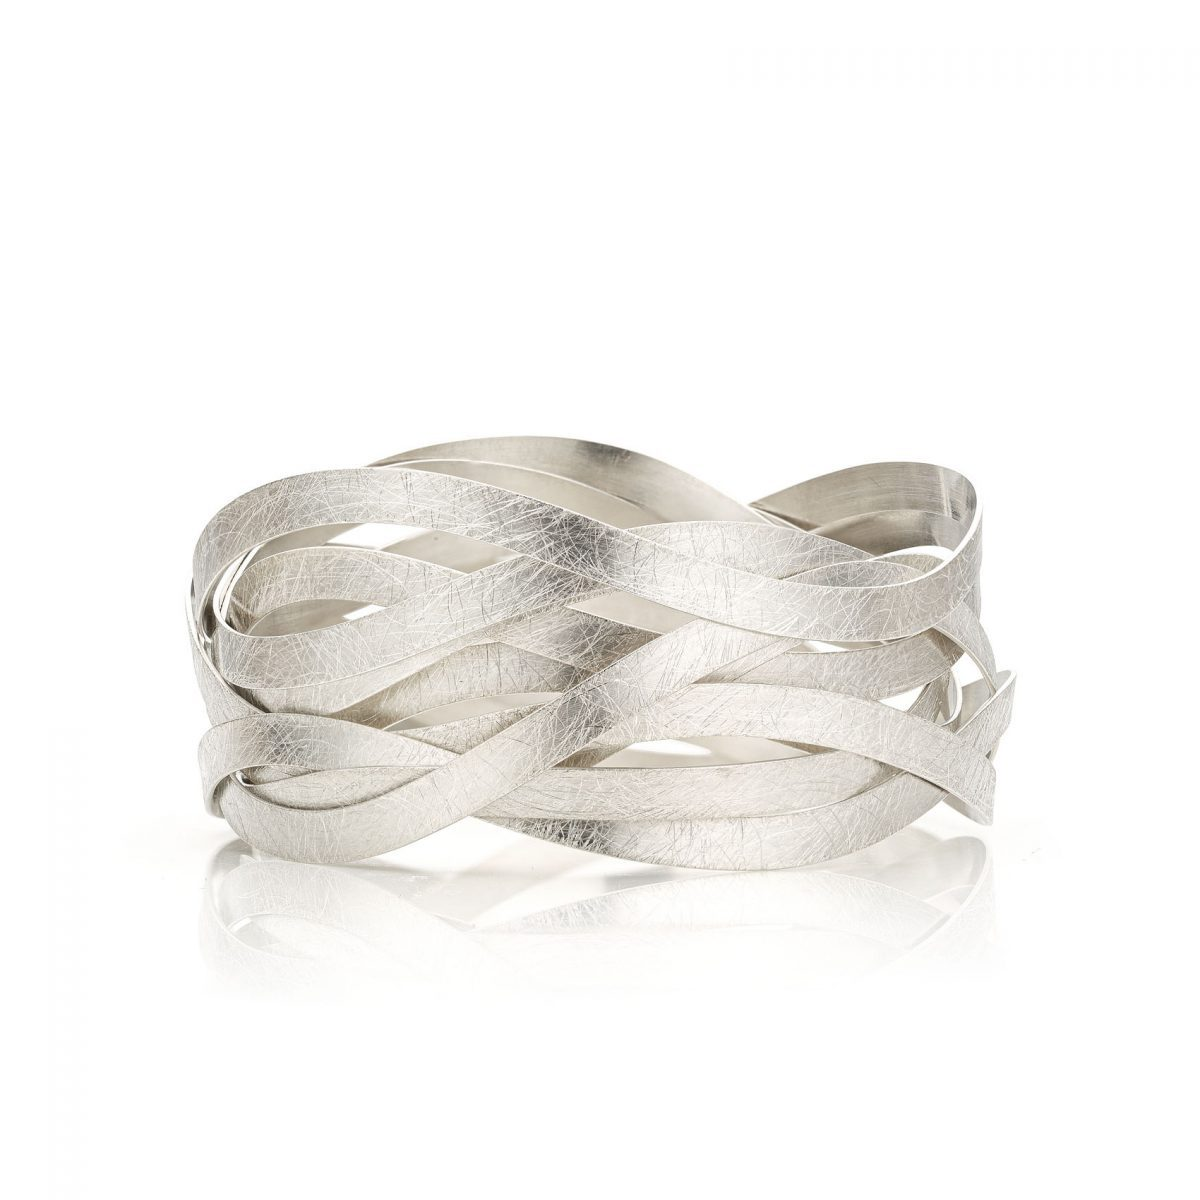 MOYA winding bracelet